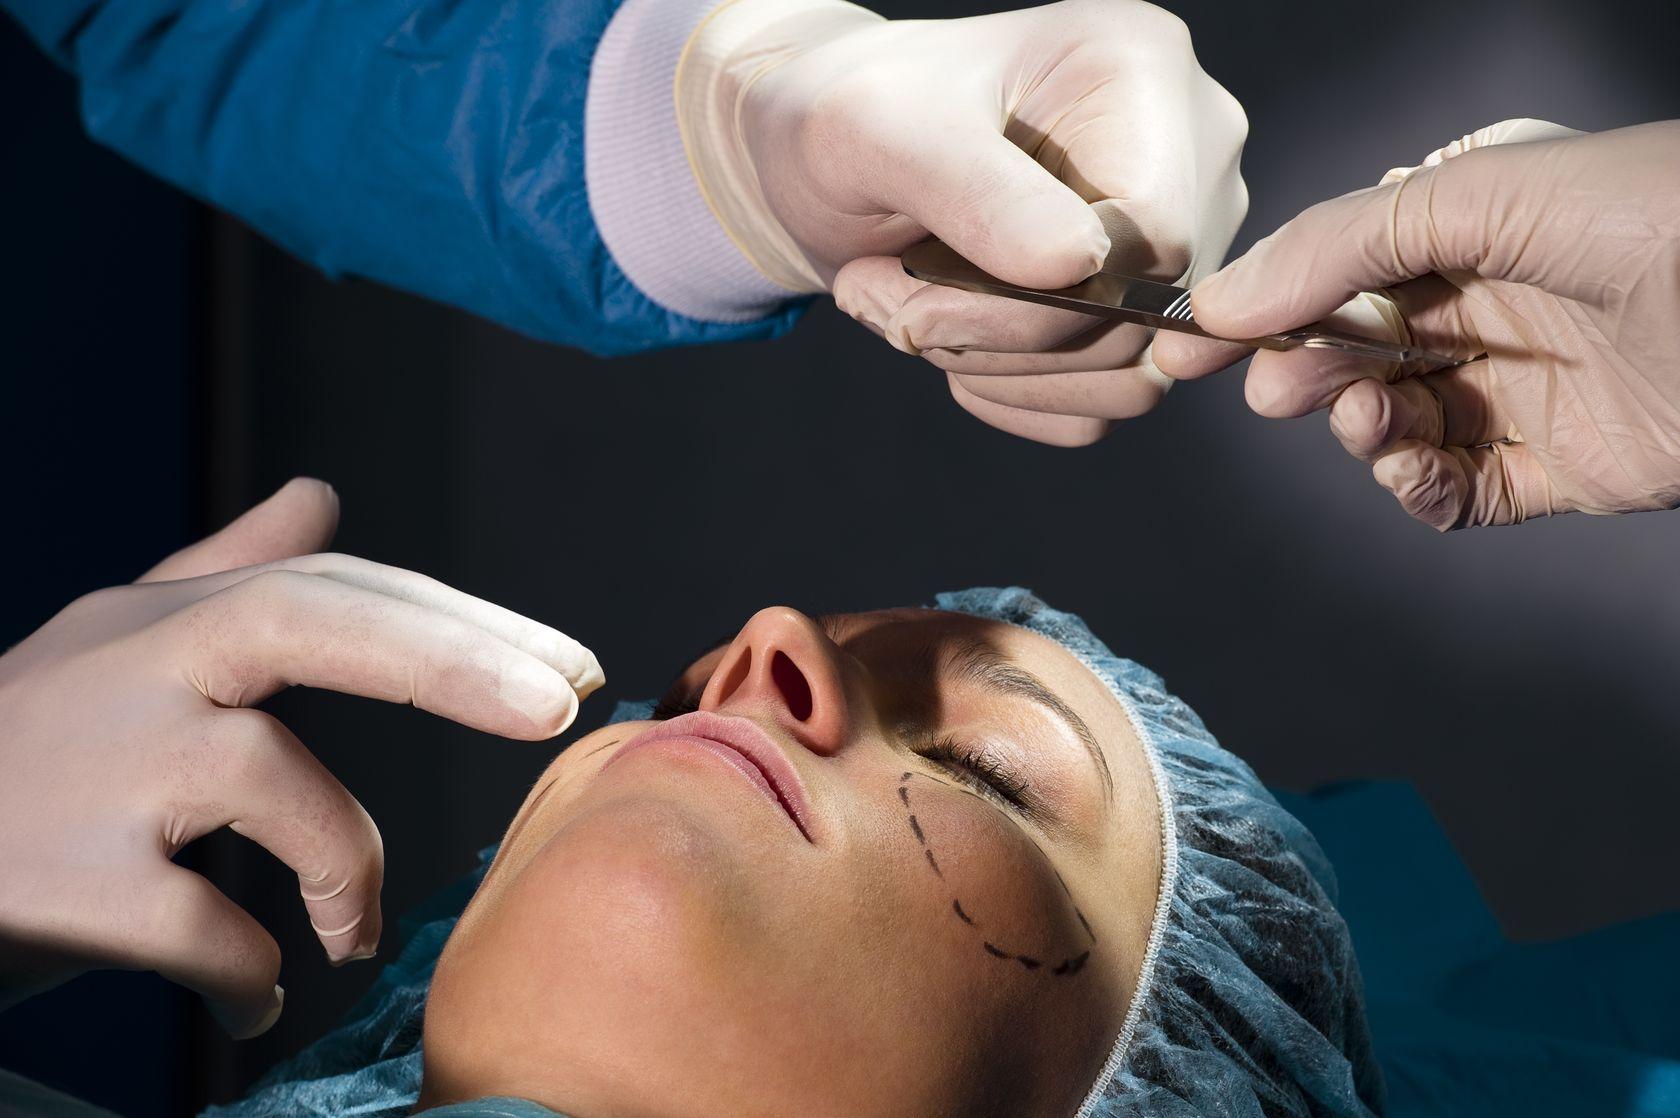 test karcsú műtét